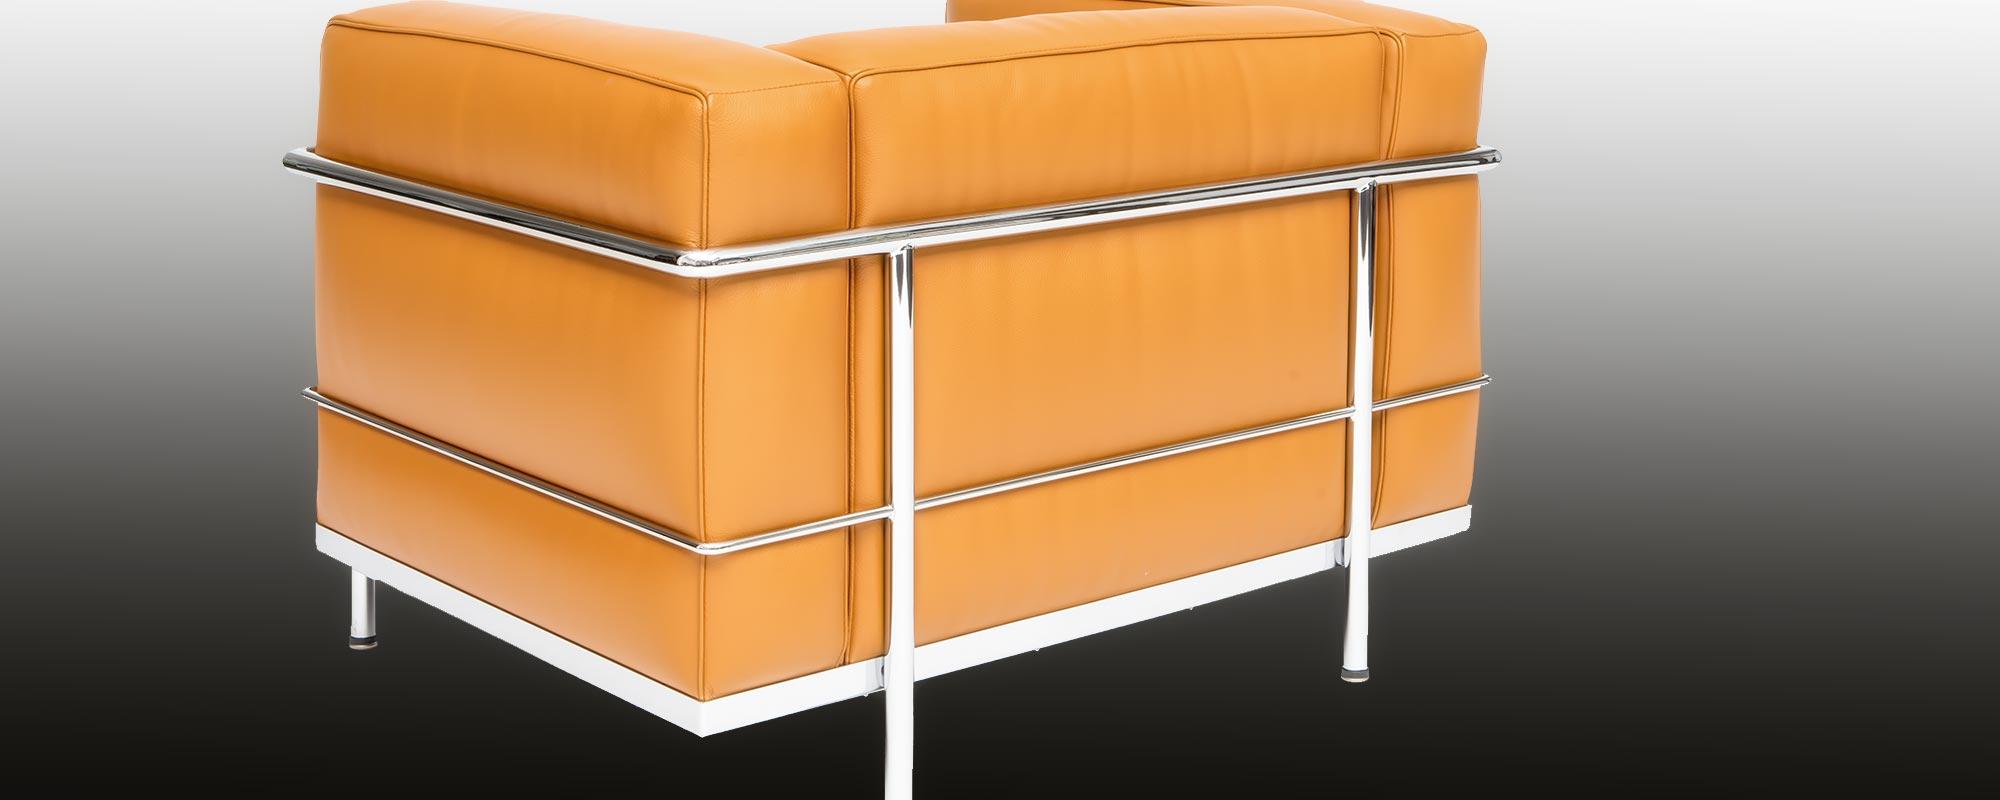 Corbusier Designed Chair Lc 31 Steelform Design Classics